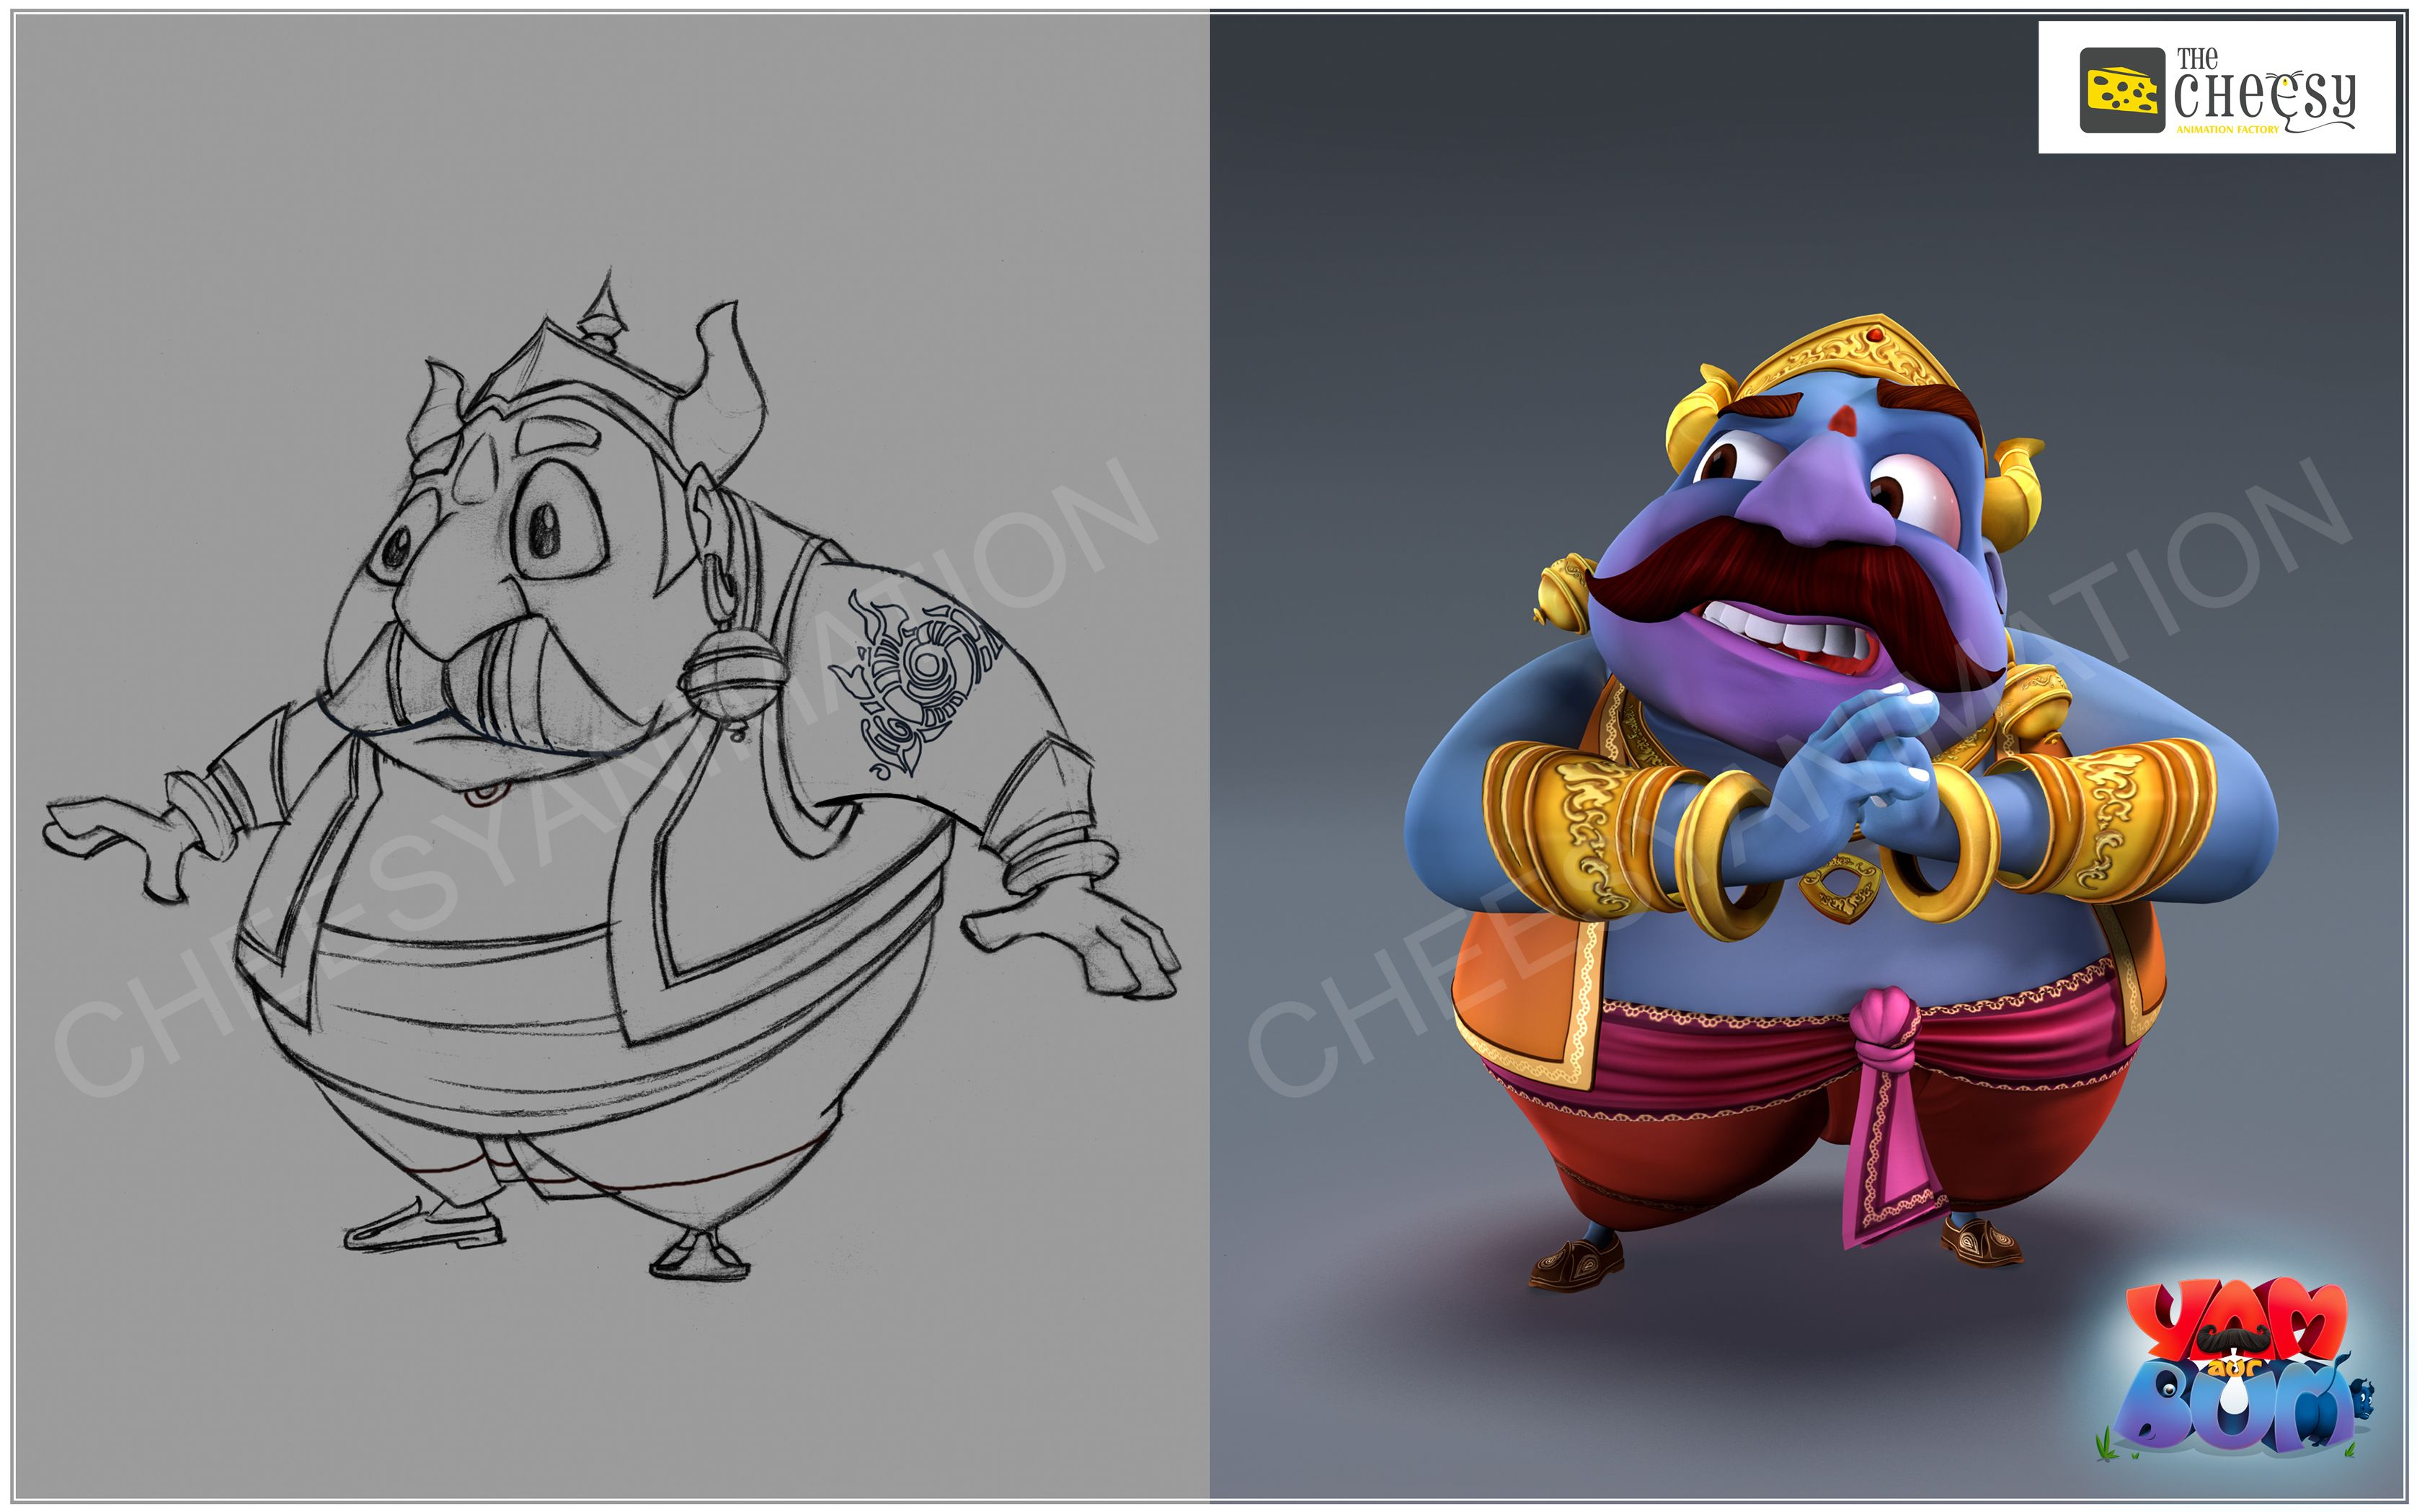 3D Character Animation 3d character animation, 2d